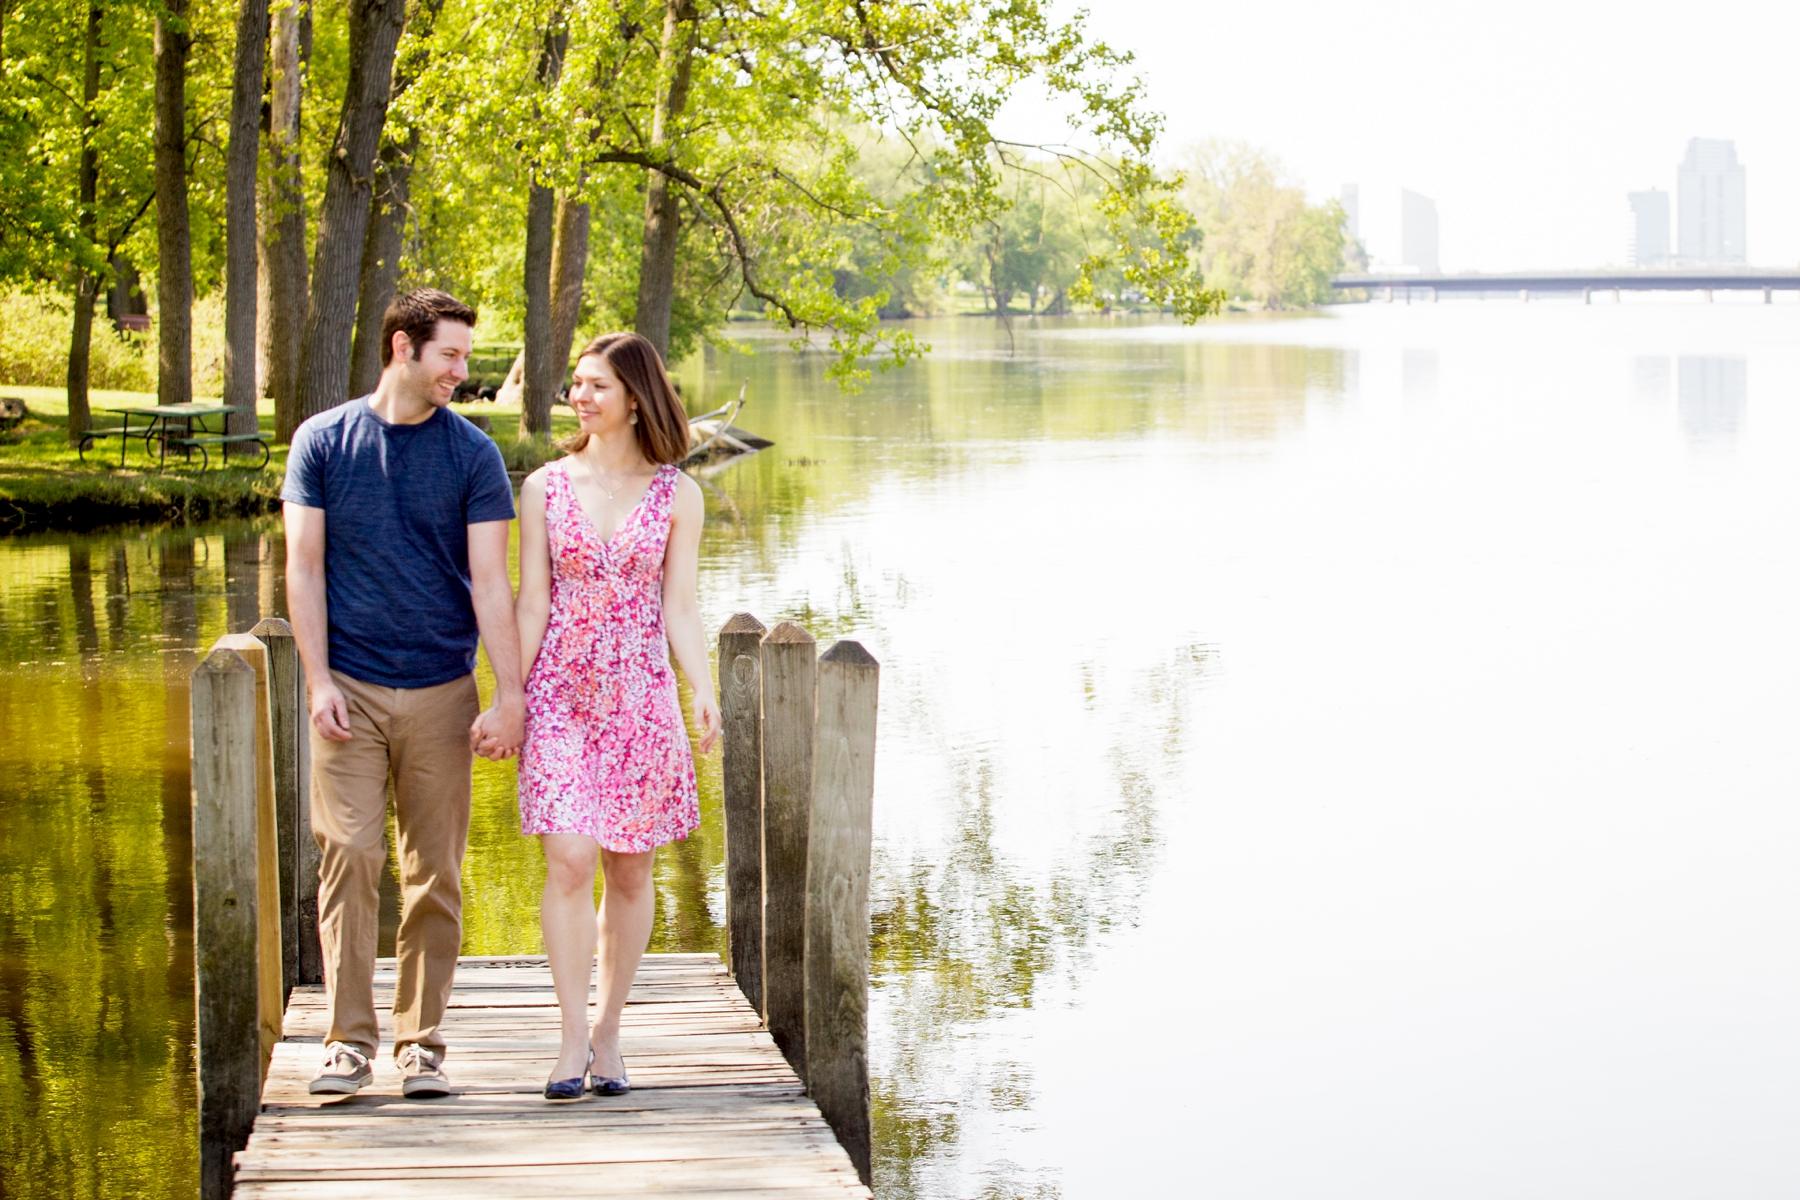 Brandon_Shafer_Photography_Michele_Chris_Michigan_Grand_Rapids_City_Engagement_0017.jpg